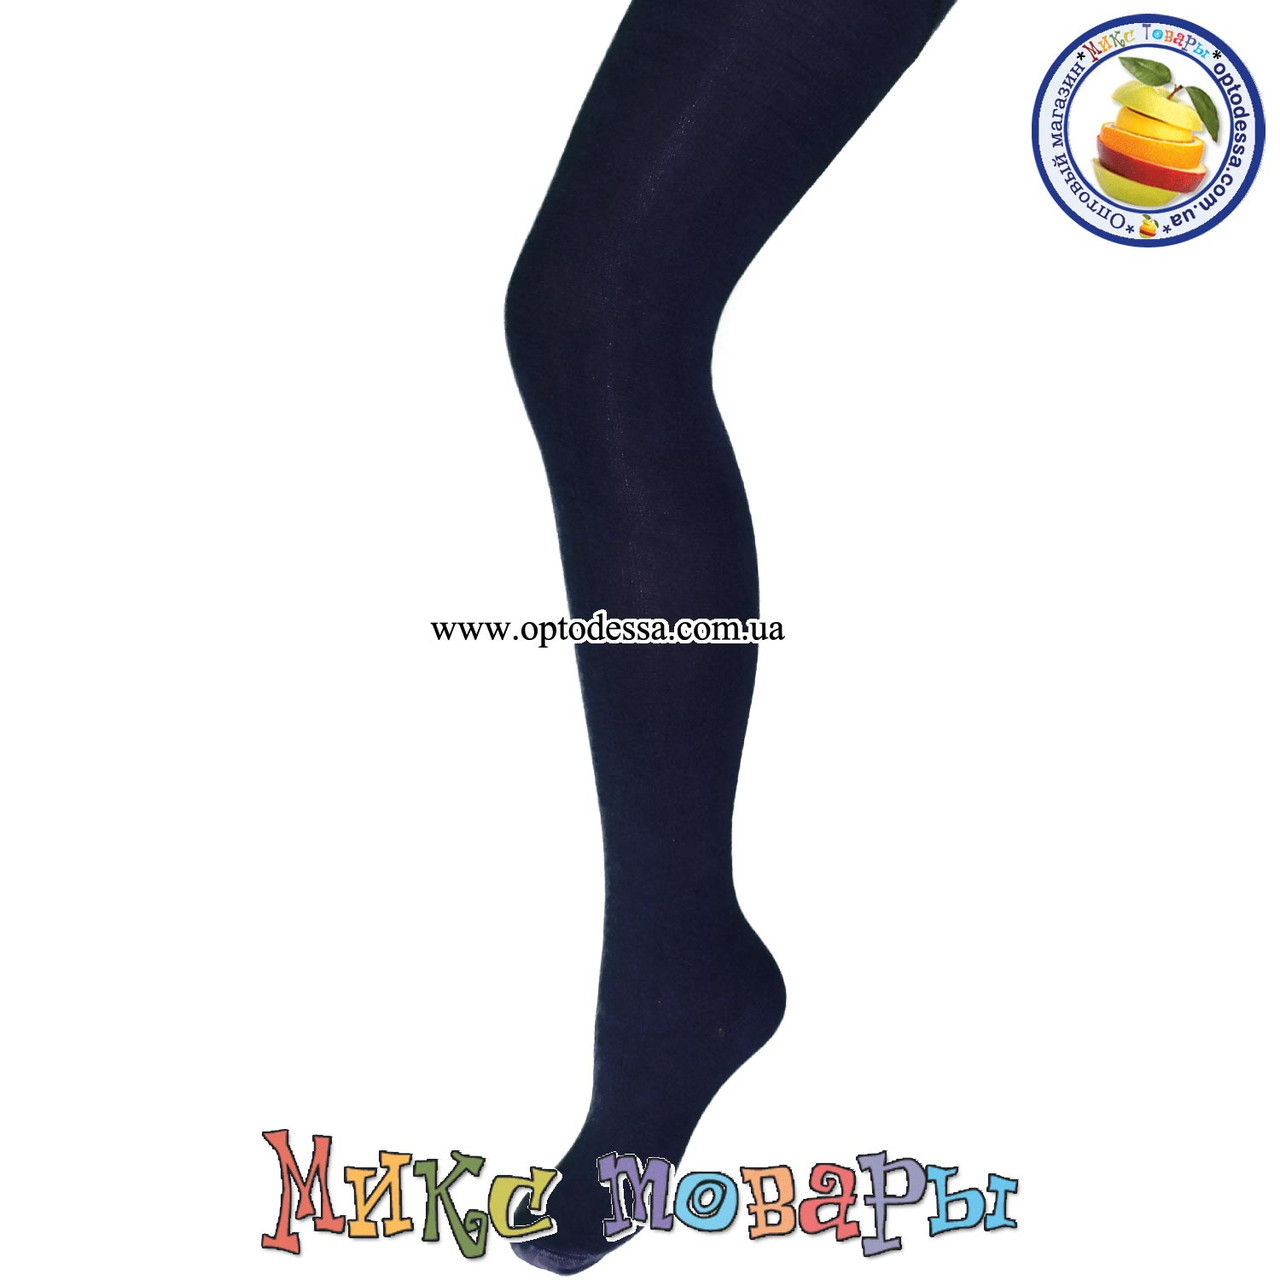 Темно синие Колготки производства Турция Размер: 11- 12 лет (15008-11)